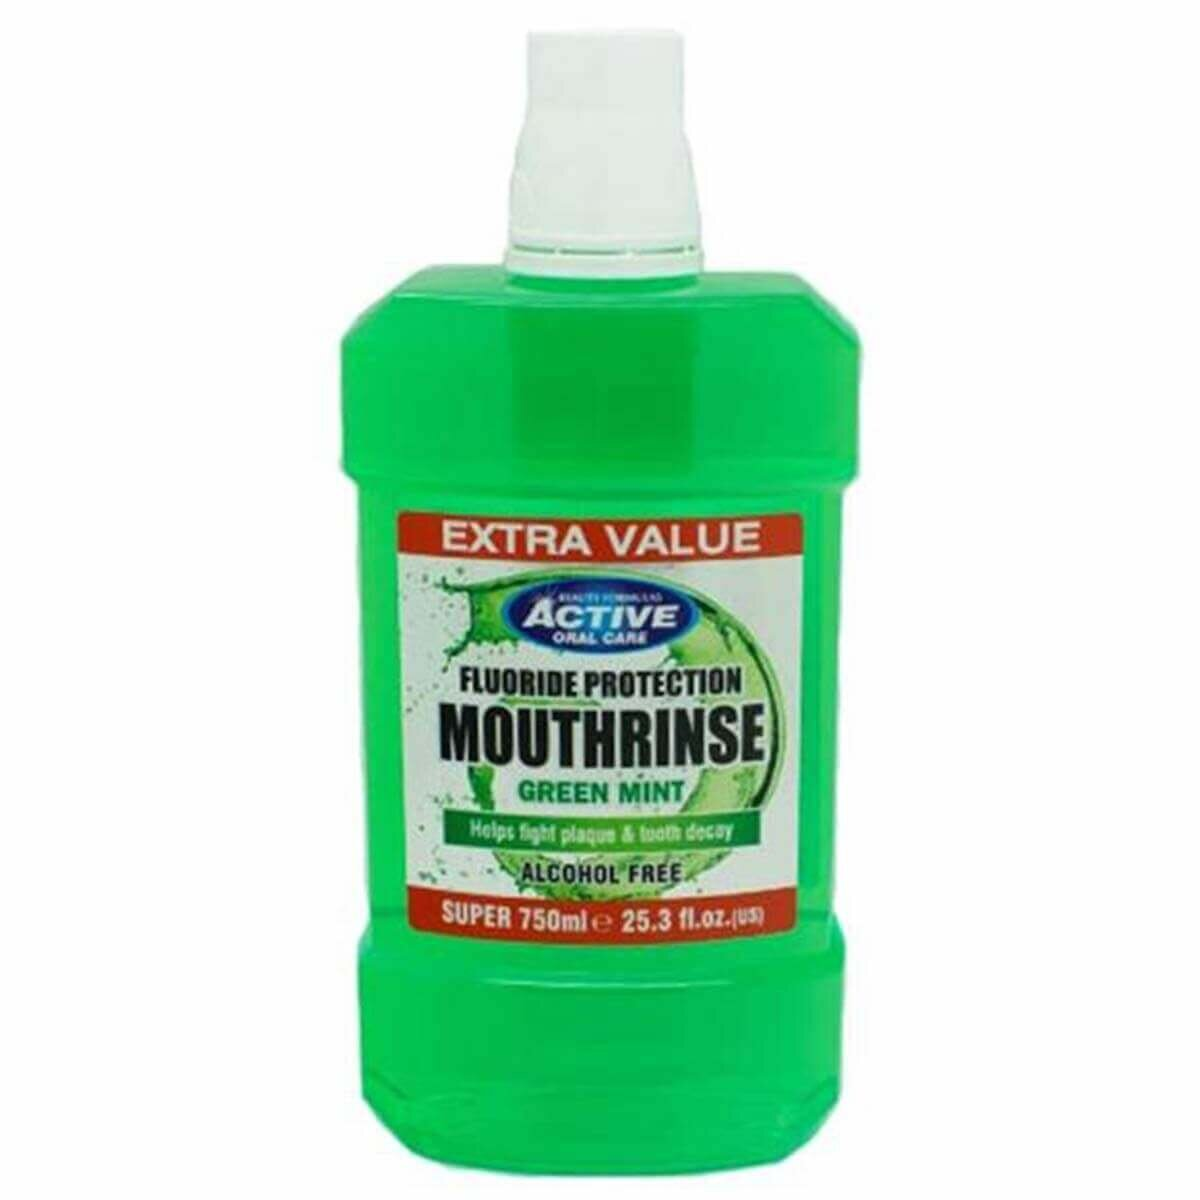 Mouthrinse Green Mint 750ml